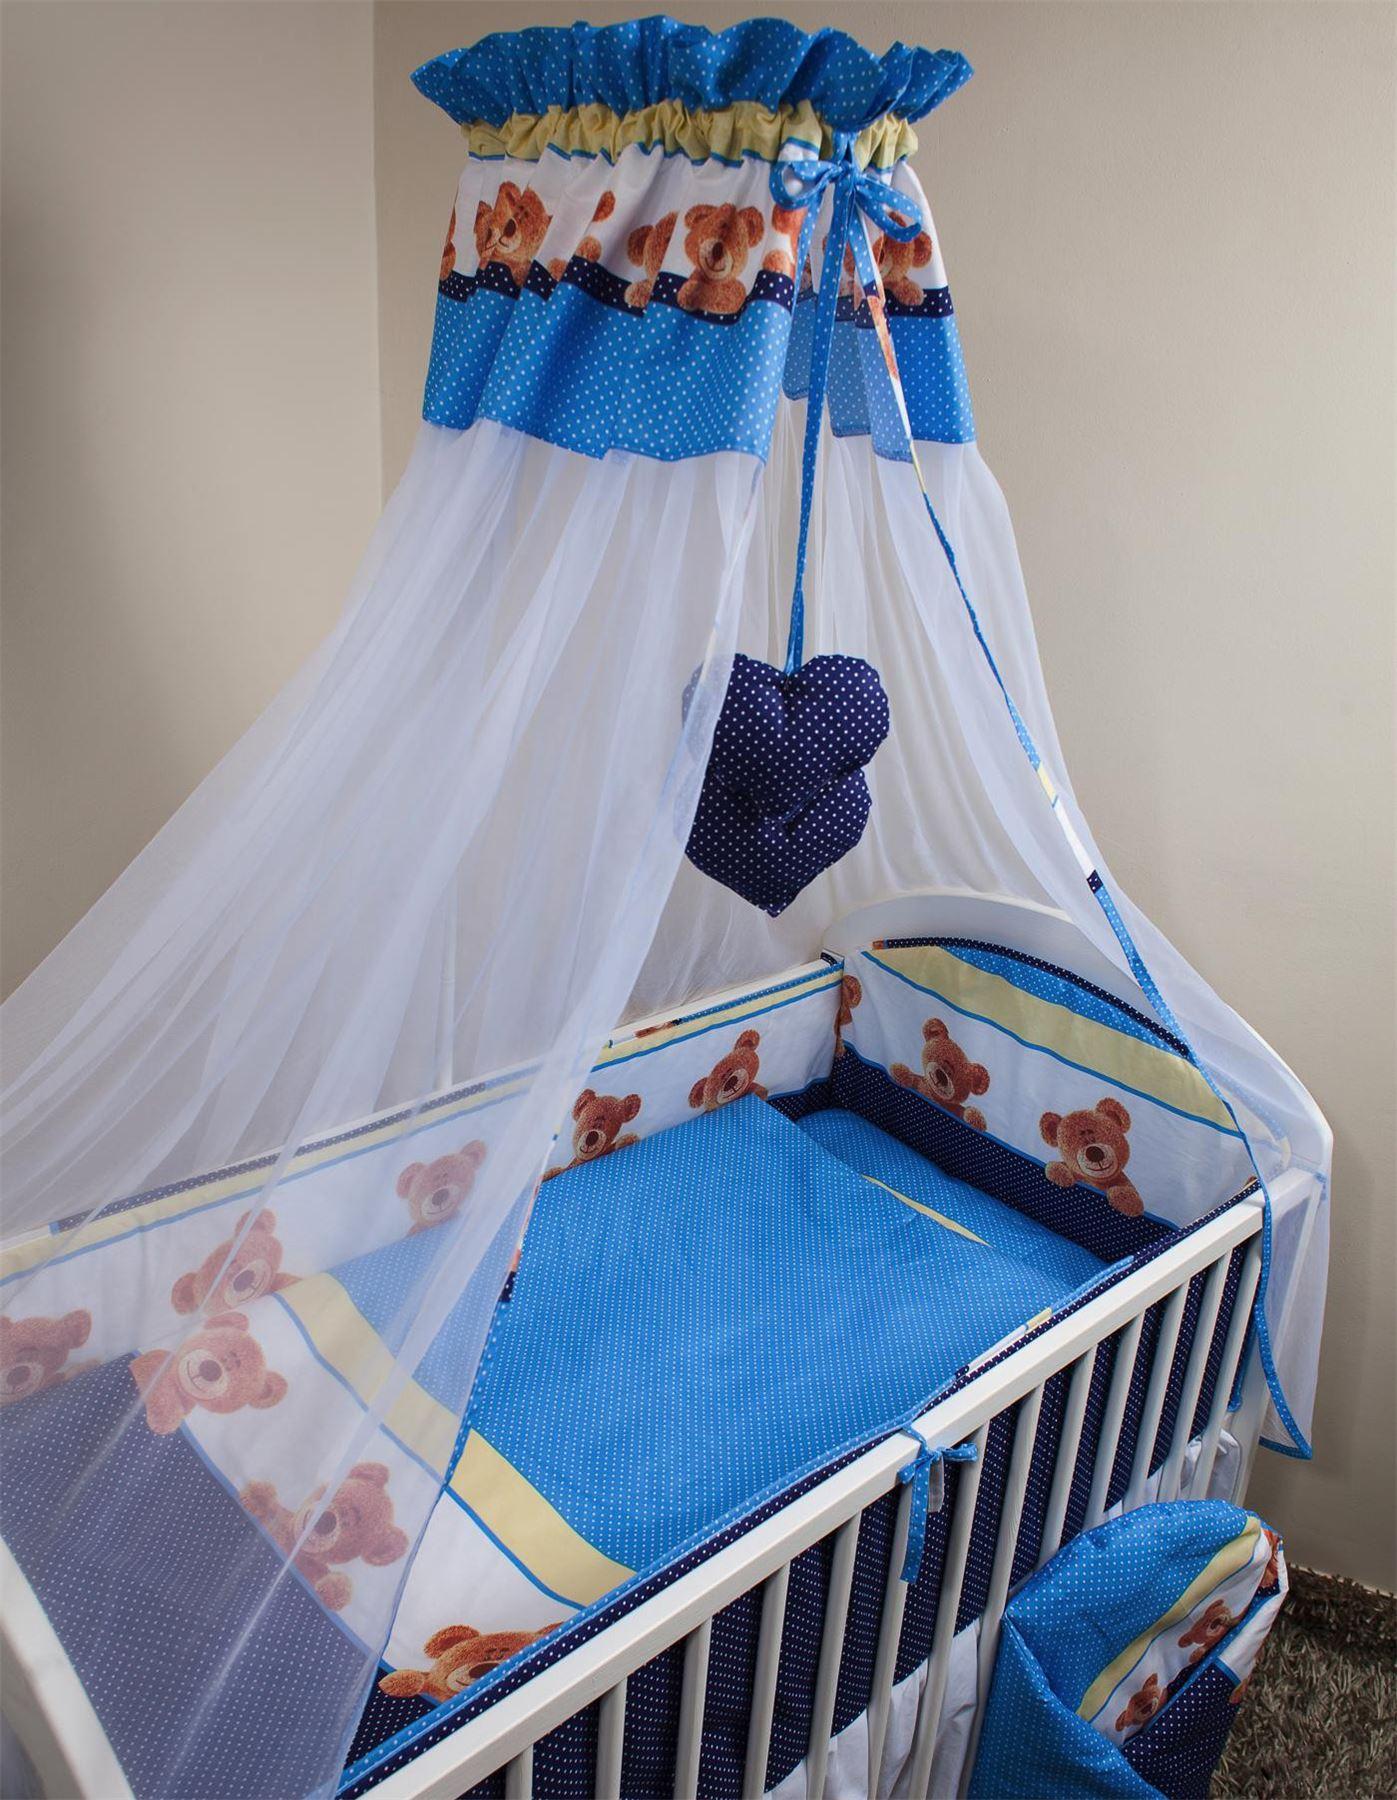 8 10 piece nursery cot bedding set pattern with canopy net bumper duvet cover ebay - Moskitonetz kinderzimmer ...